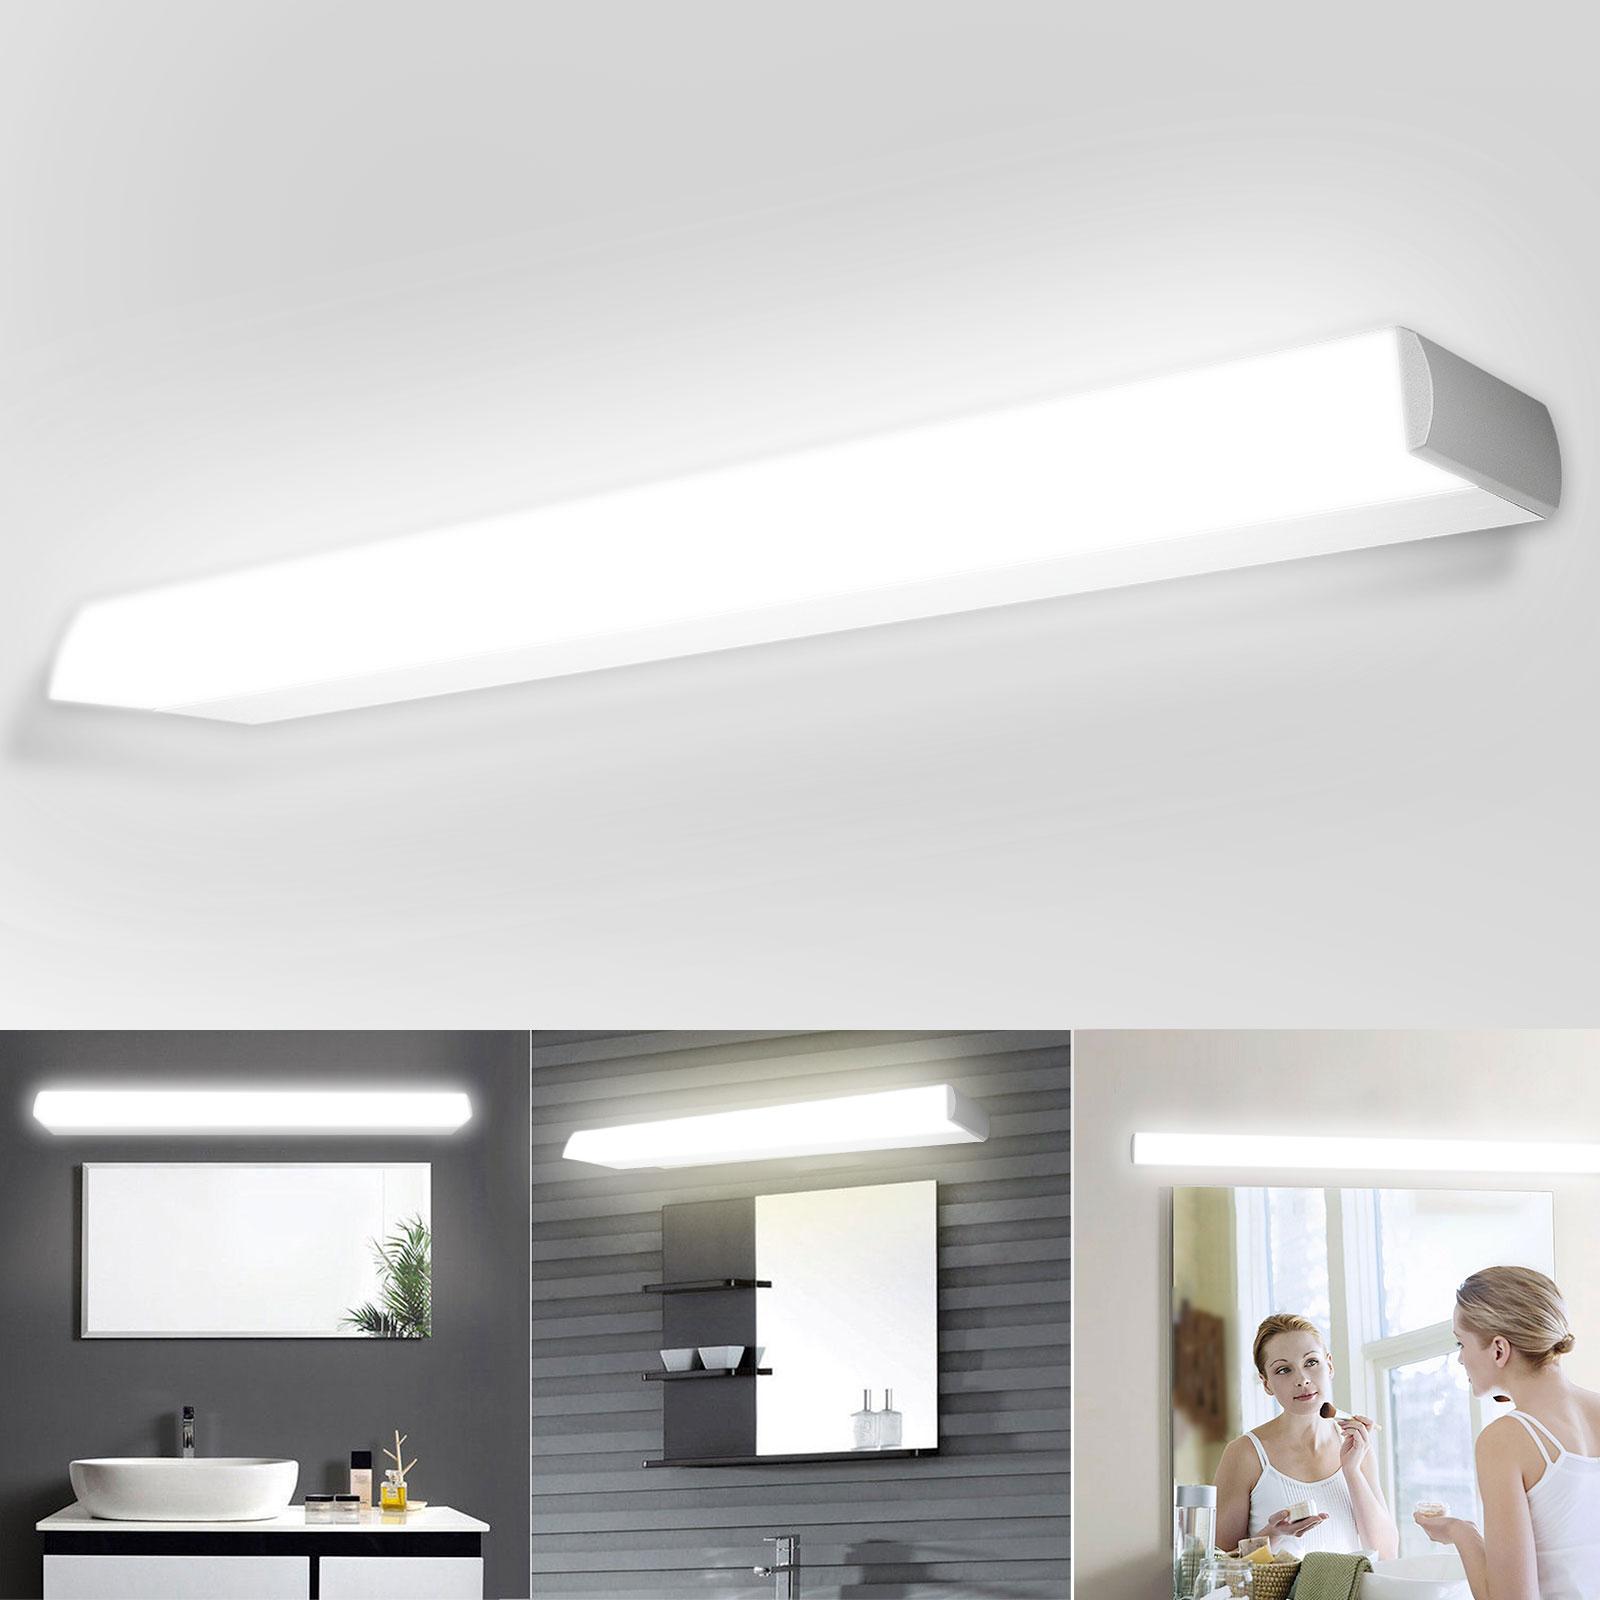 tsv 21 65in led bathroom vanity light fixtures modern wall sconce modern bathroom vanity mirror front lights for bathroom bedroom cabinet